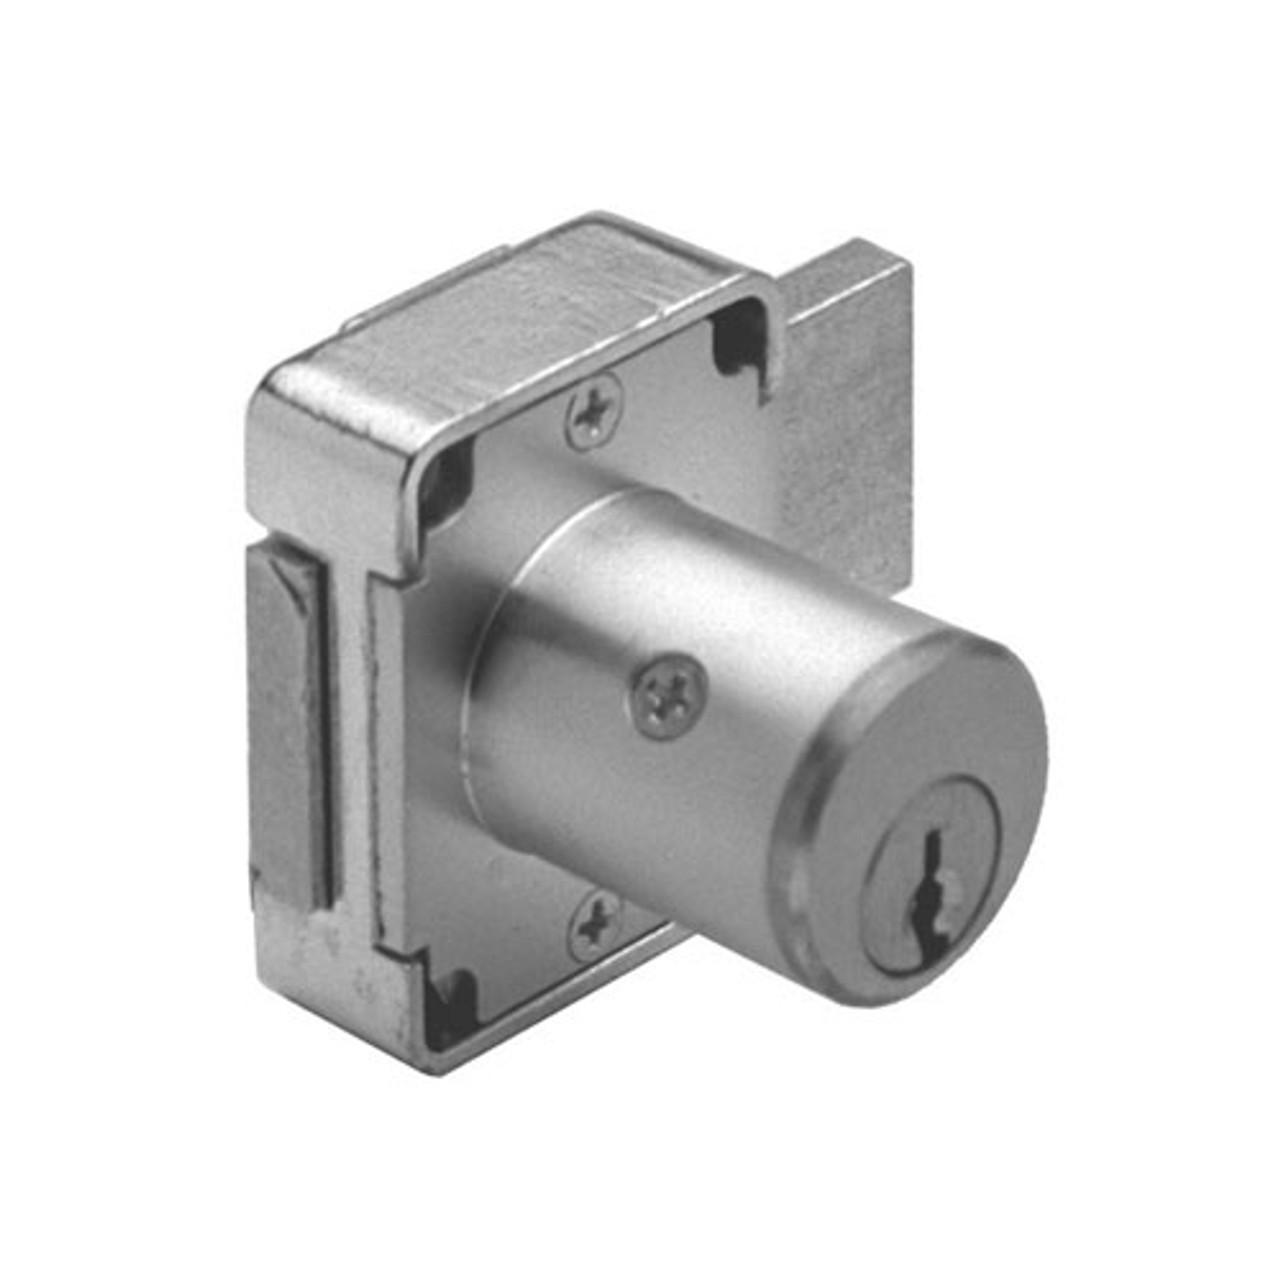 Olympus 100DR-KD-26D-7/8 Deadbolt Locks in Satin Chrome Finish